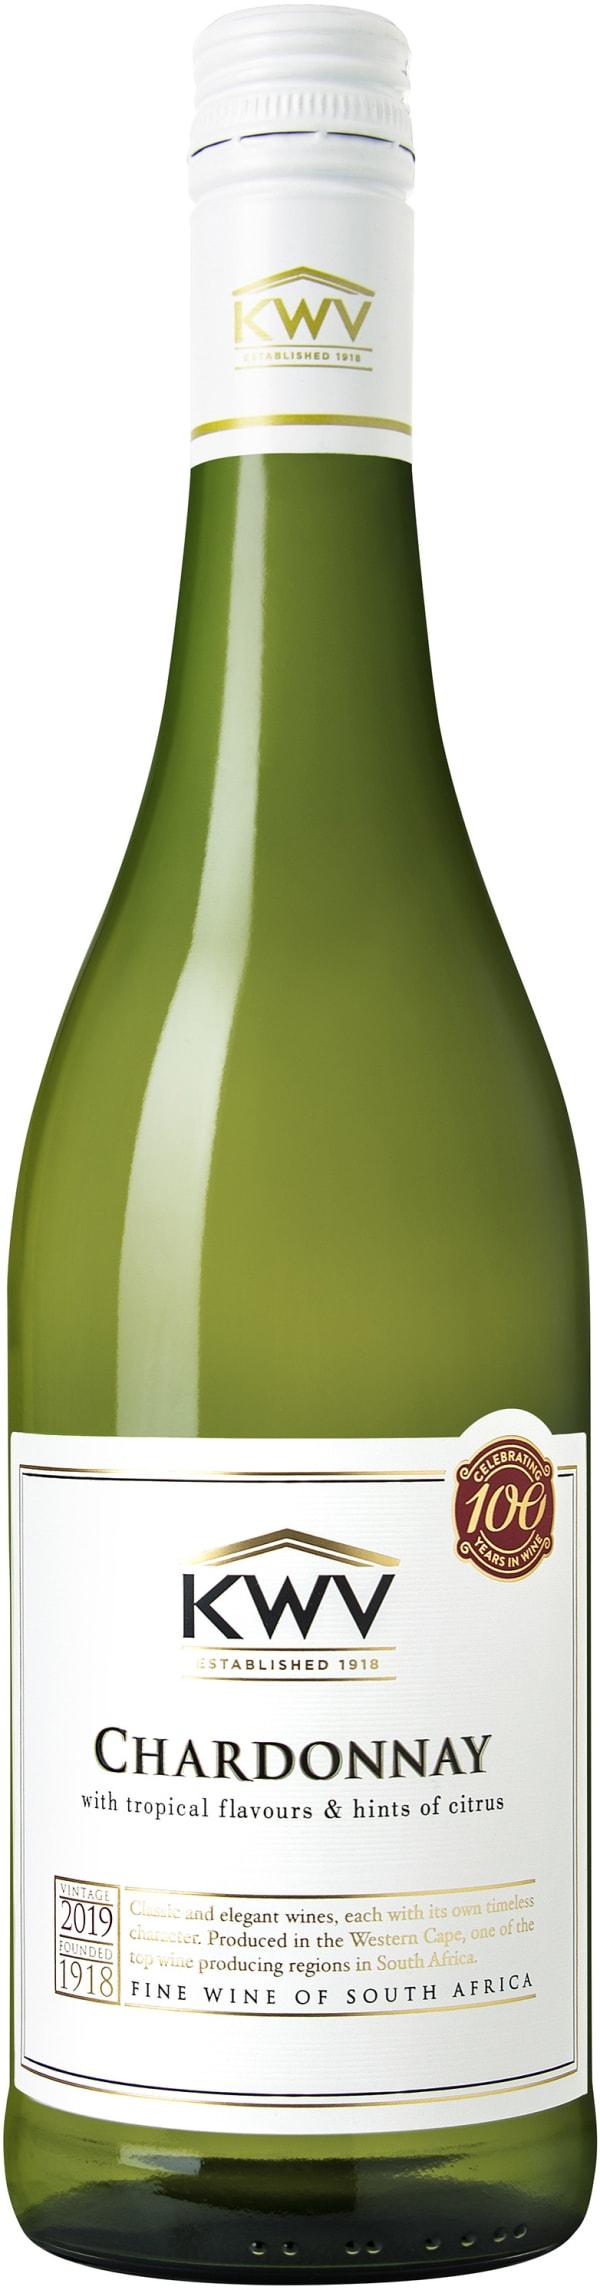 KWV Classic Collection Chardonnay 2018